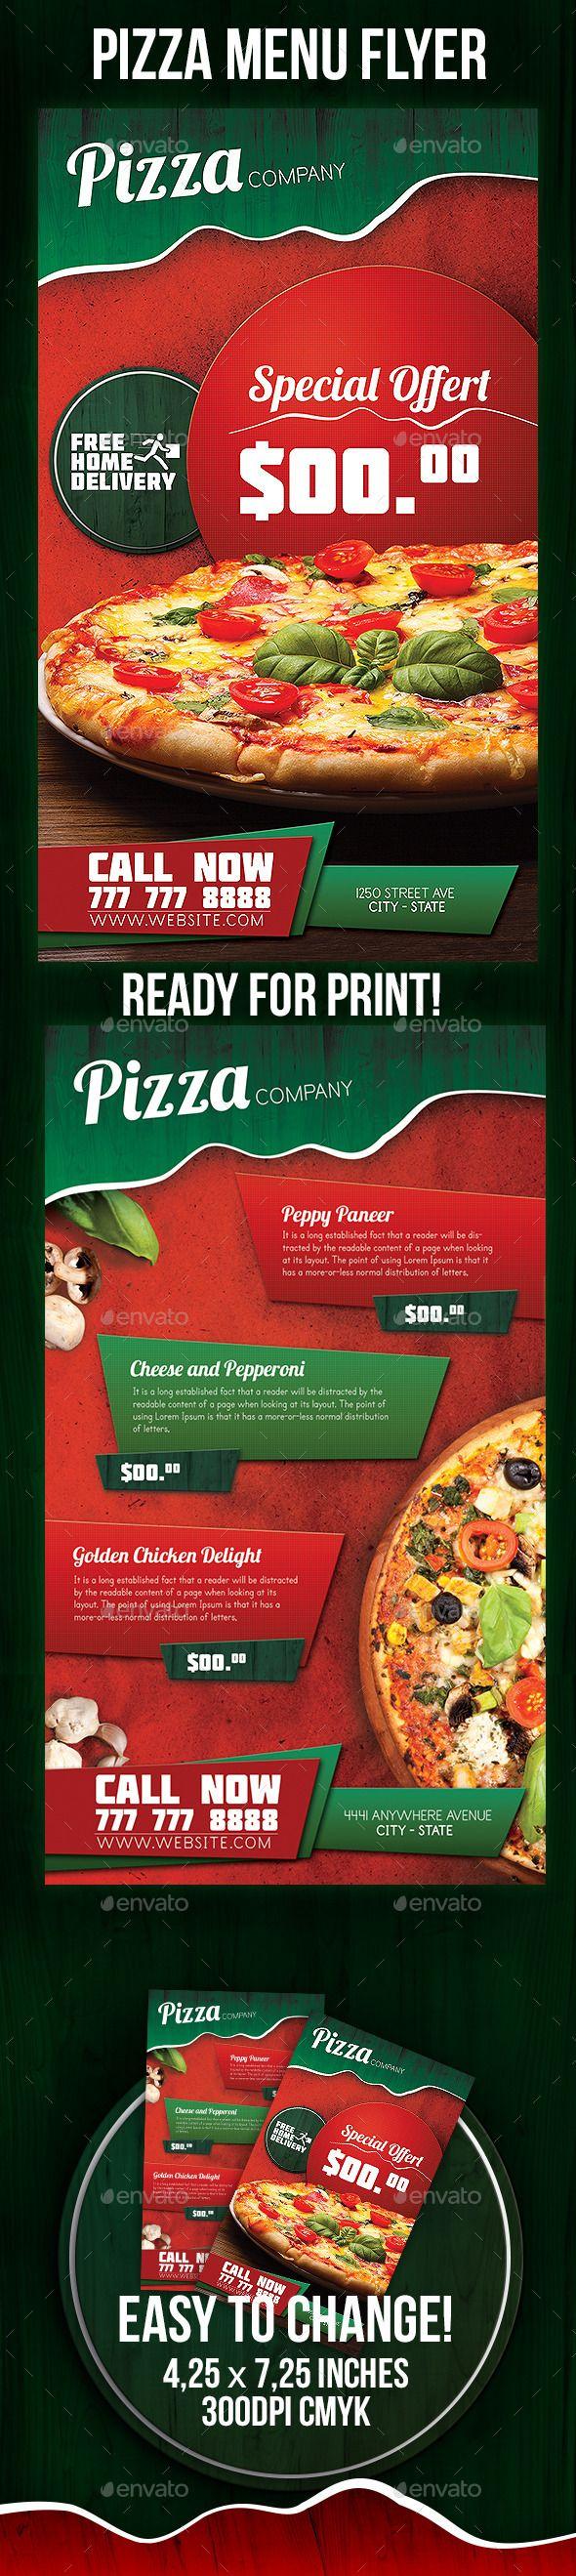 Pizza Menu Flyer Template #design Download: http://graphicriver.net/item/pizza-menu-flyer/9332720?ref=ksioks